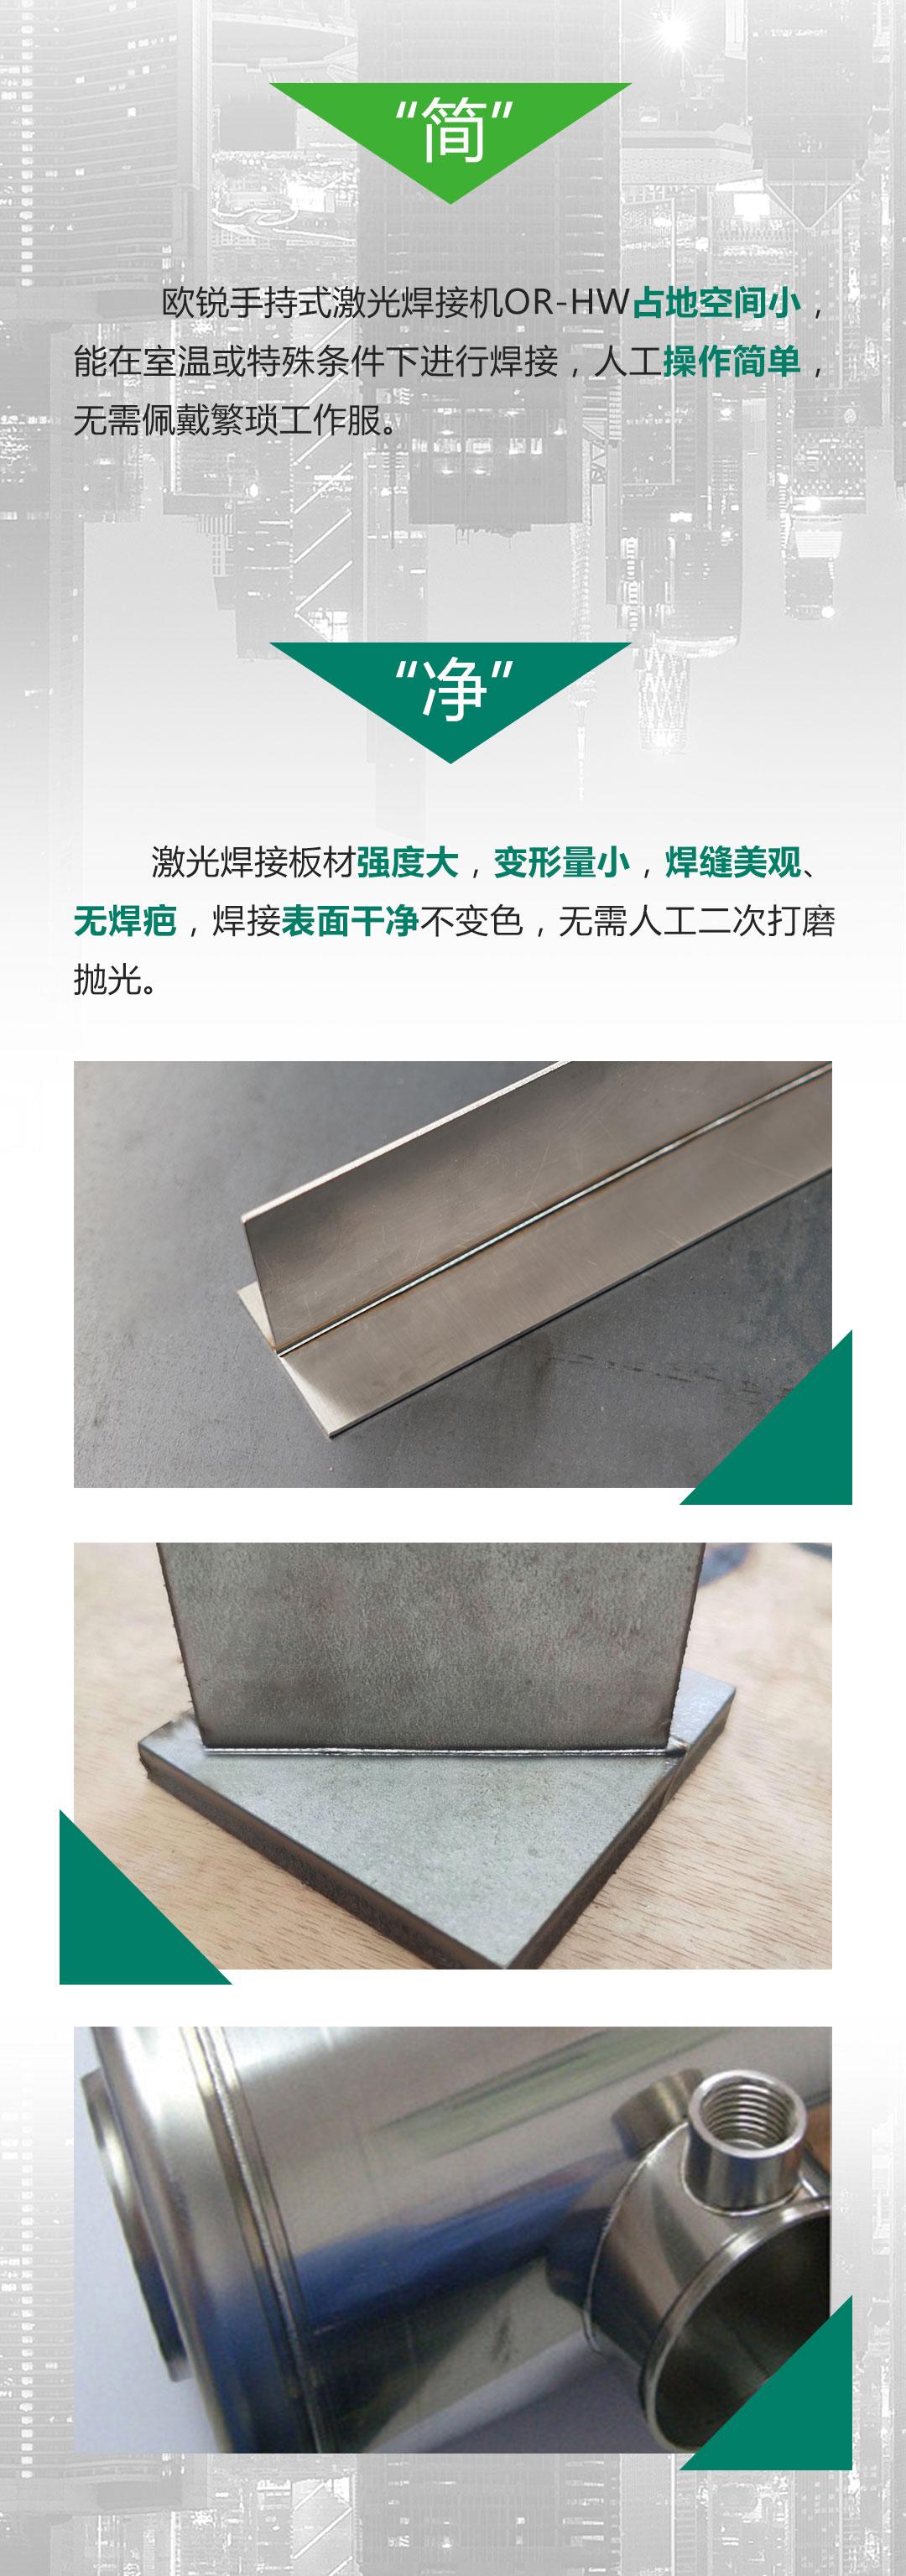 OR-HW长海报-2.jpg